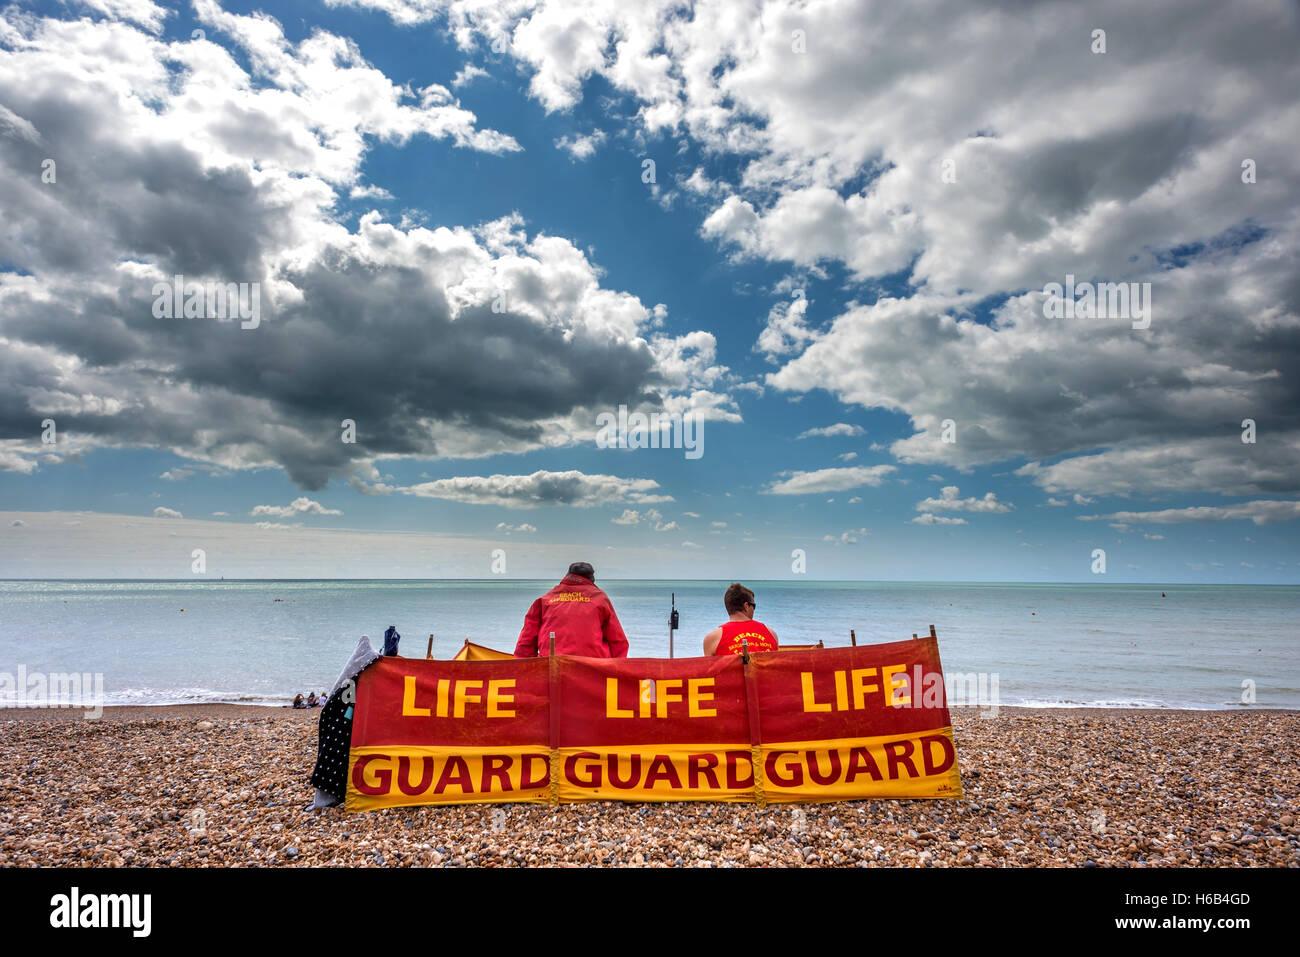 Lifeguards on Brighton beach - Stock Image